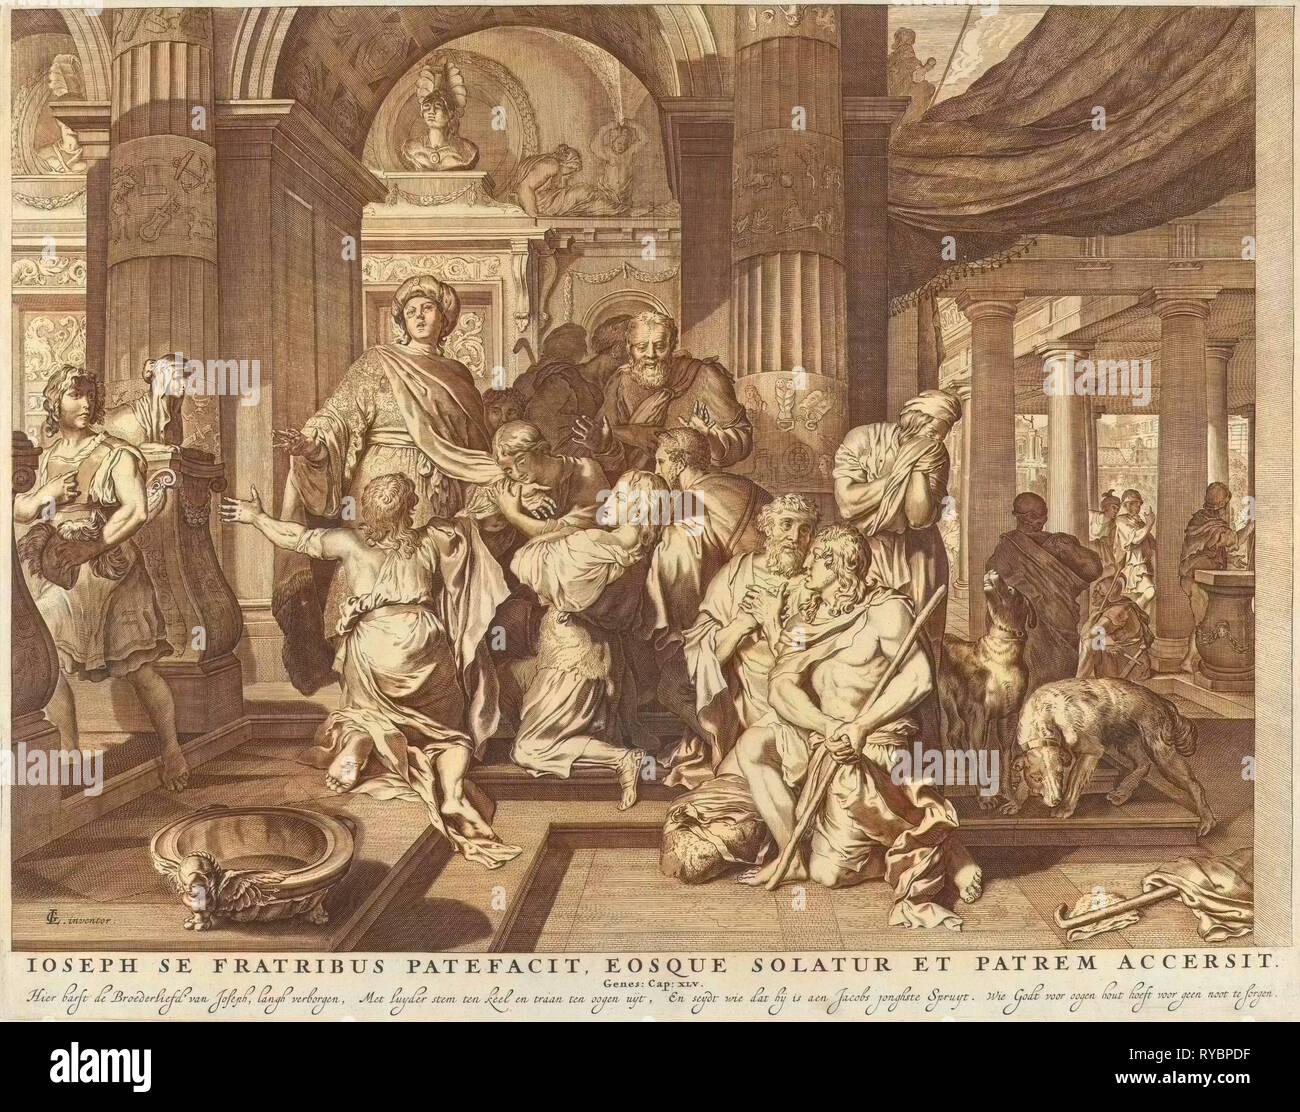 Joseph reveals himself to his brothers, Anonymous, Nicolaes Visscher (I),  Nicolaes